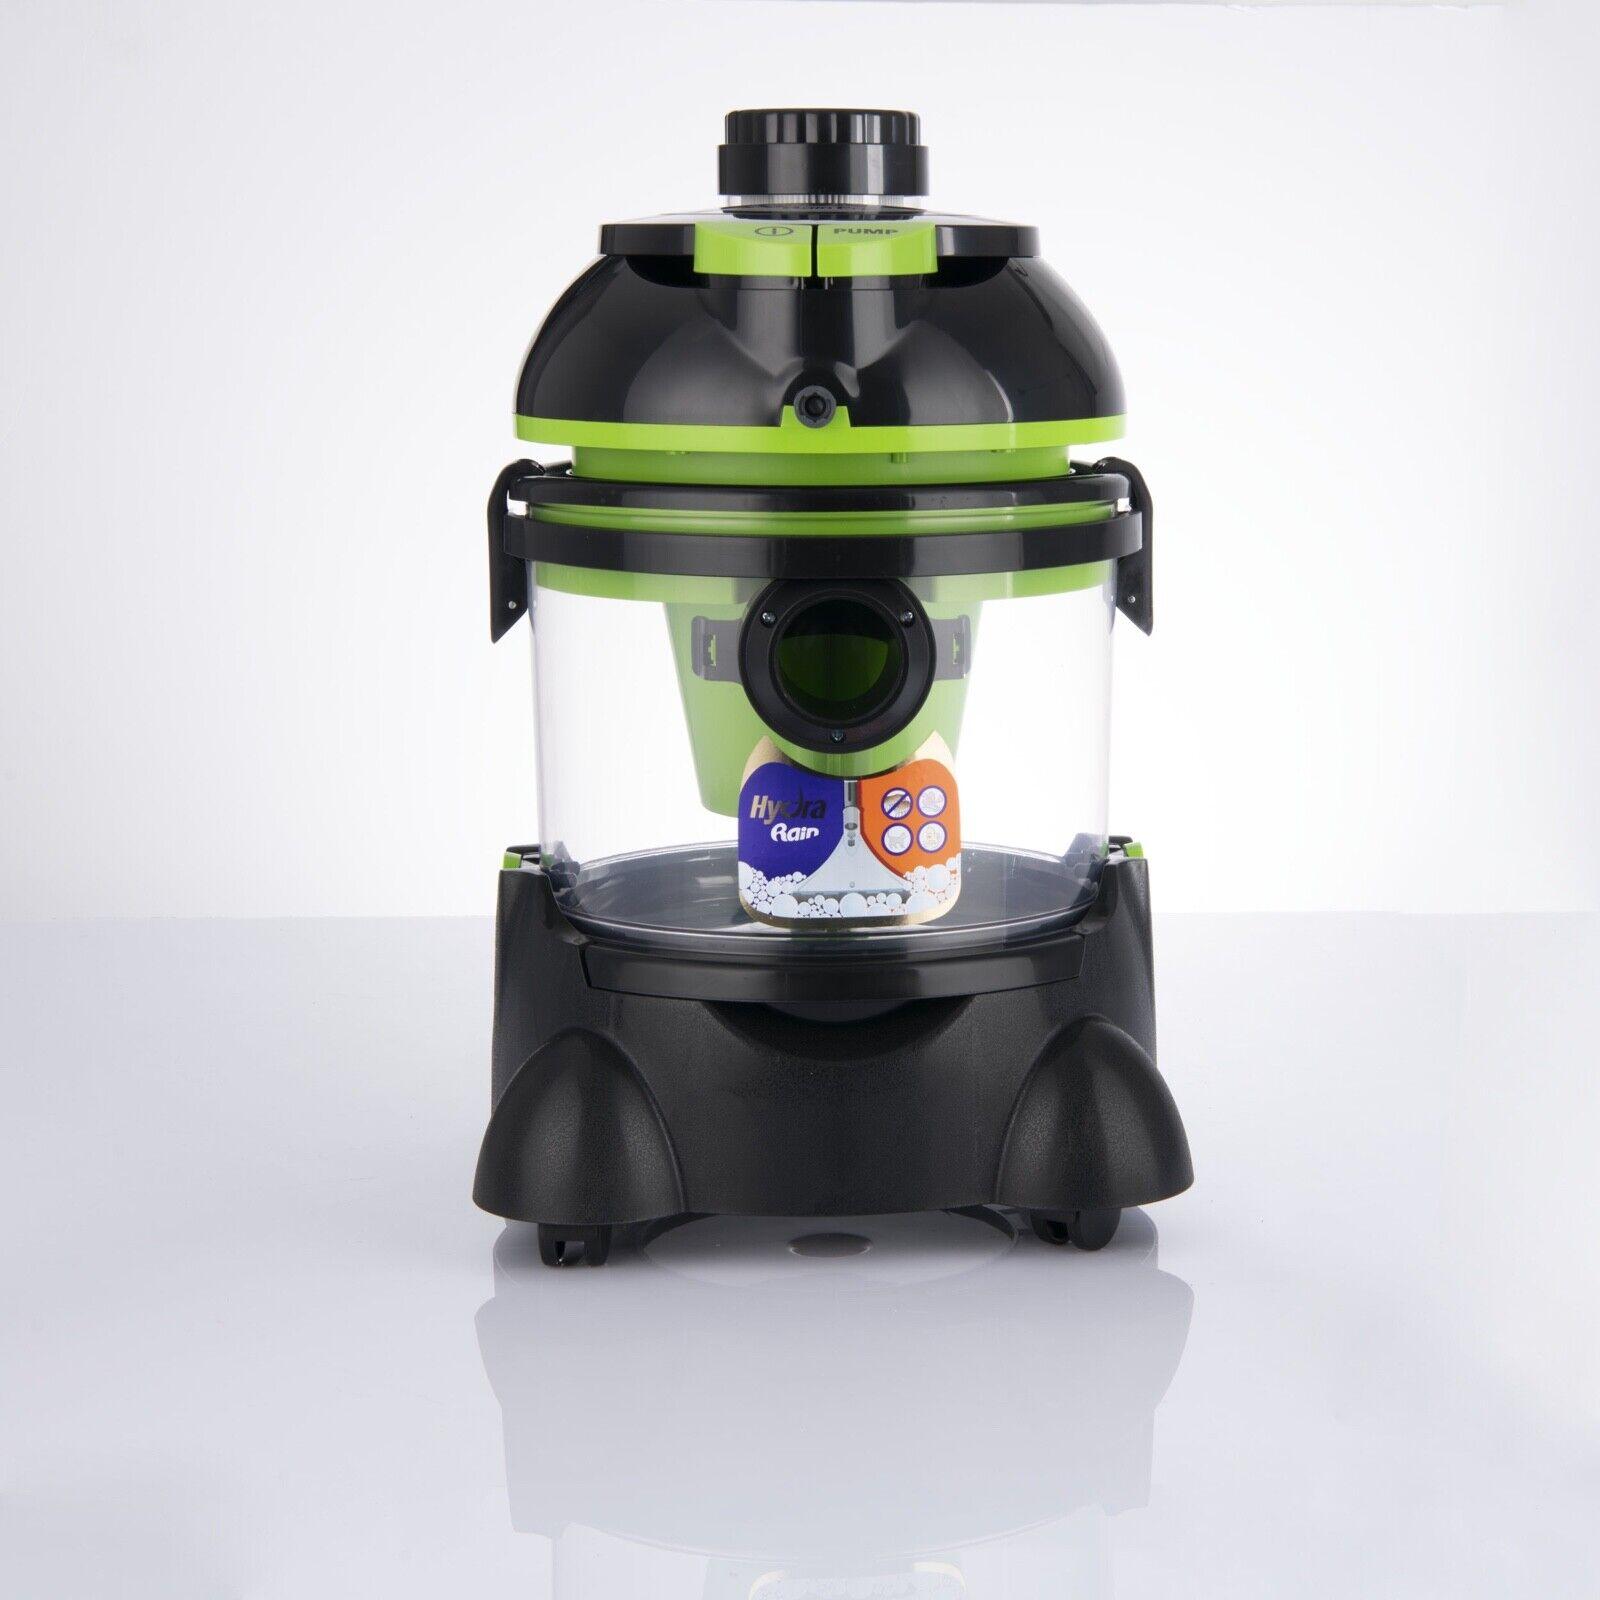 arnica Hydra Rain Pro All in One Staubsauger Wasserfilter Nass & Trockensauger